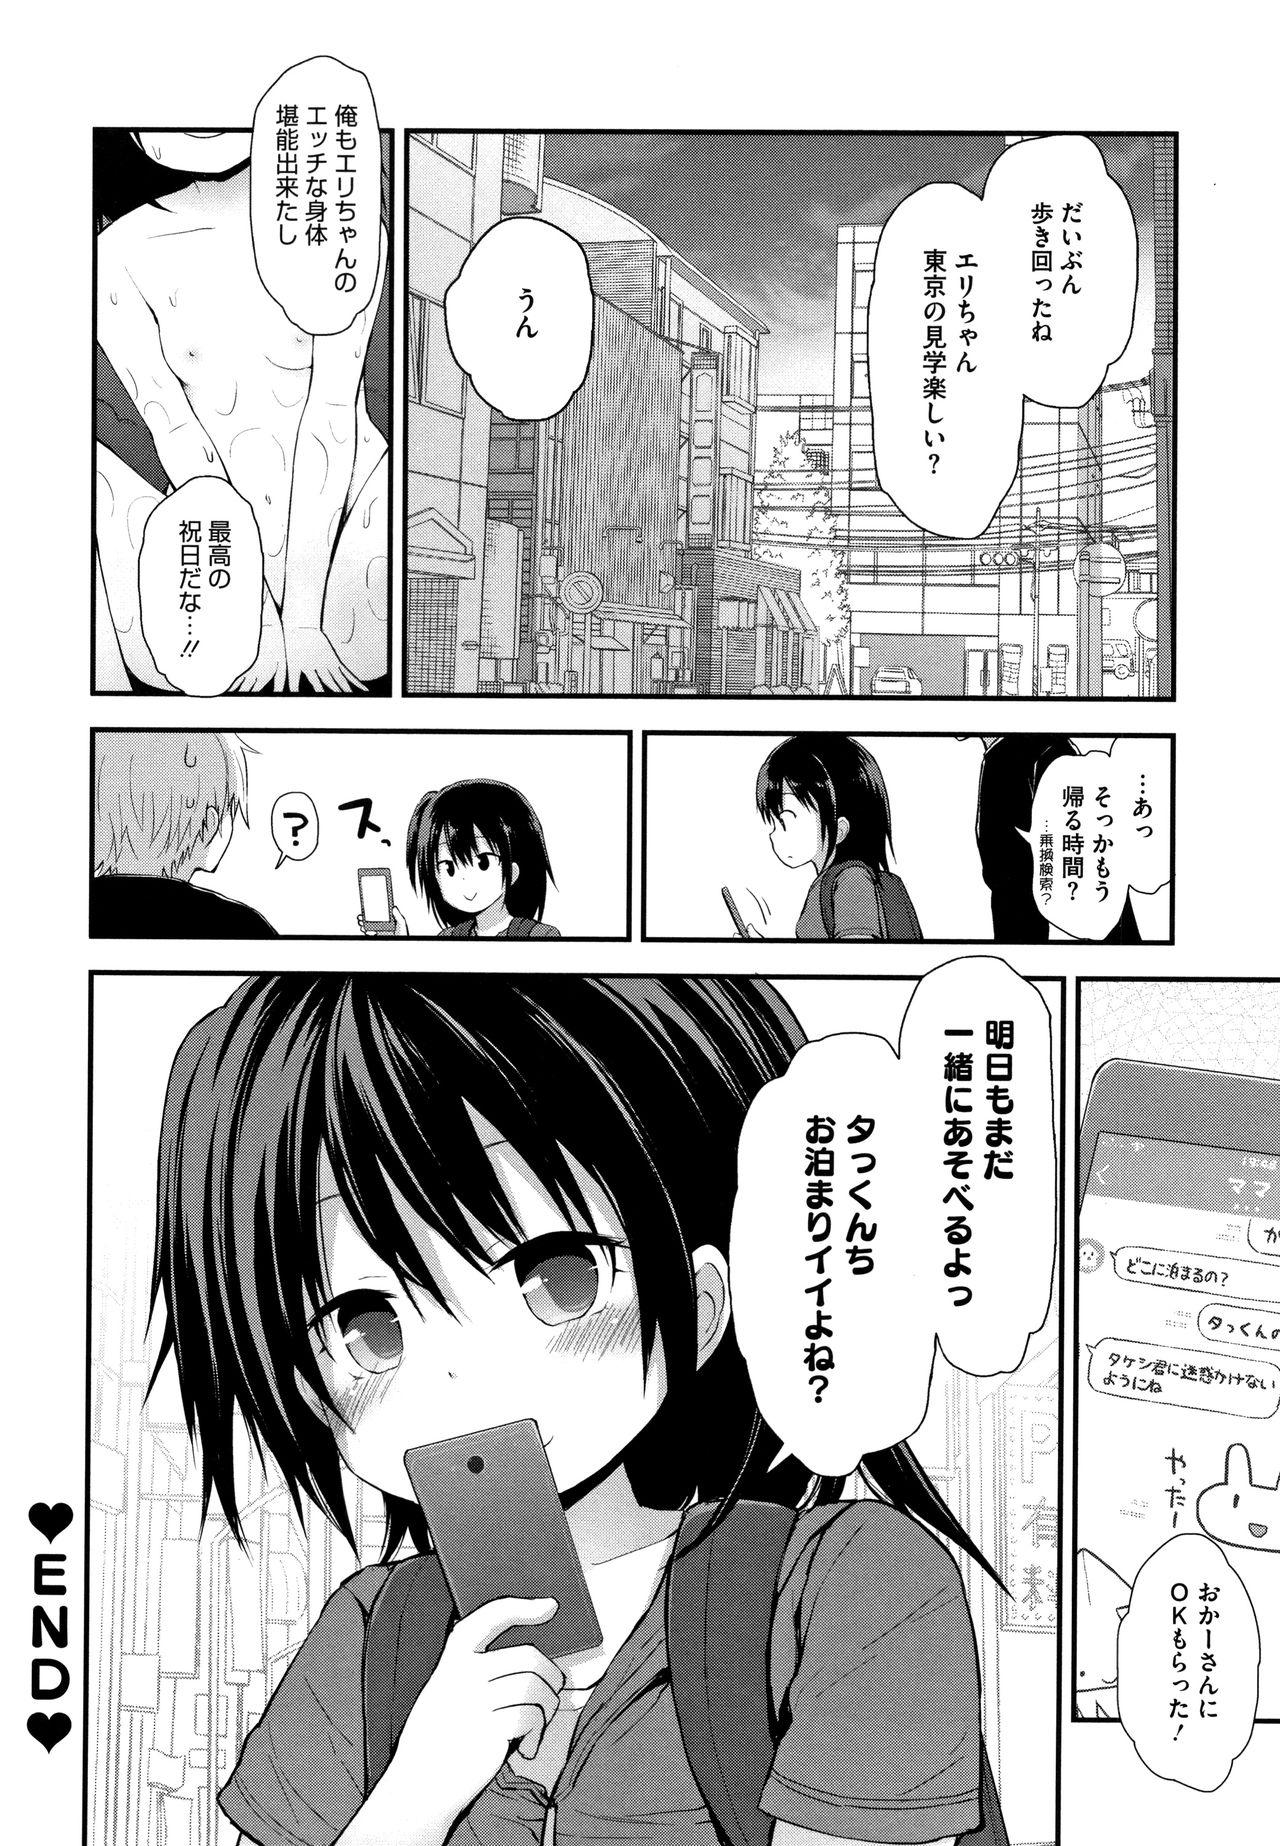 Chiisana Koukishin 176